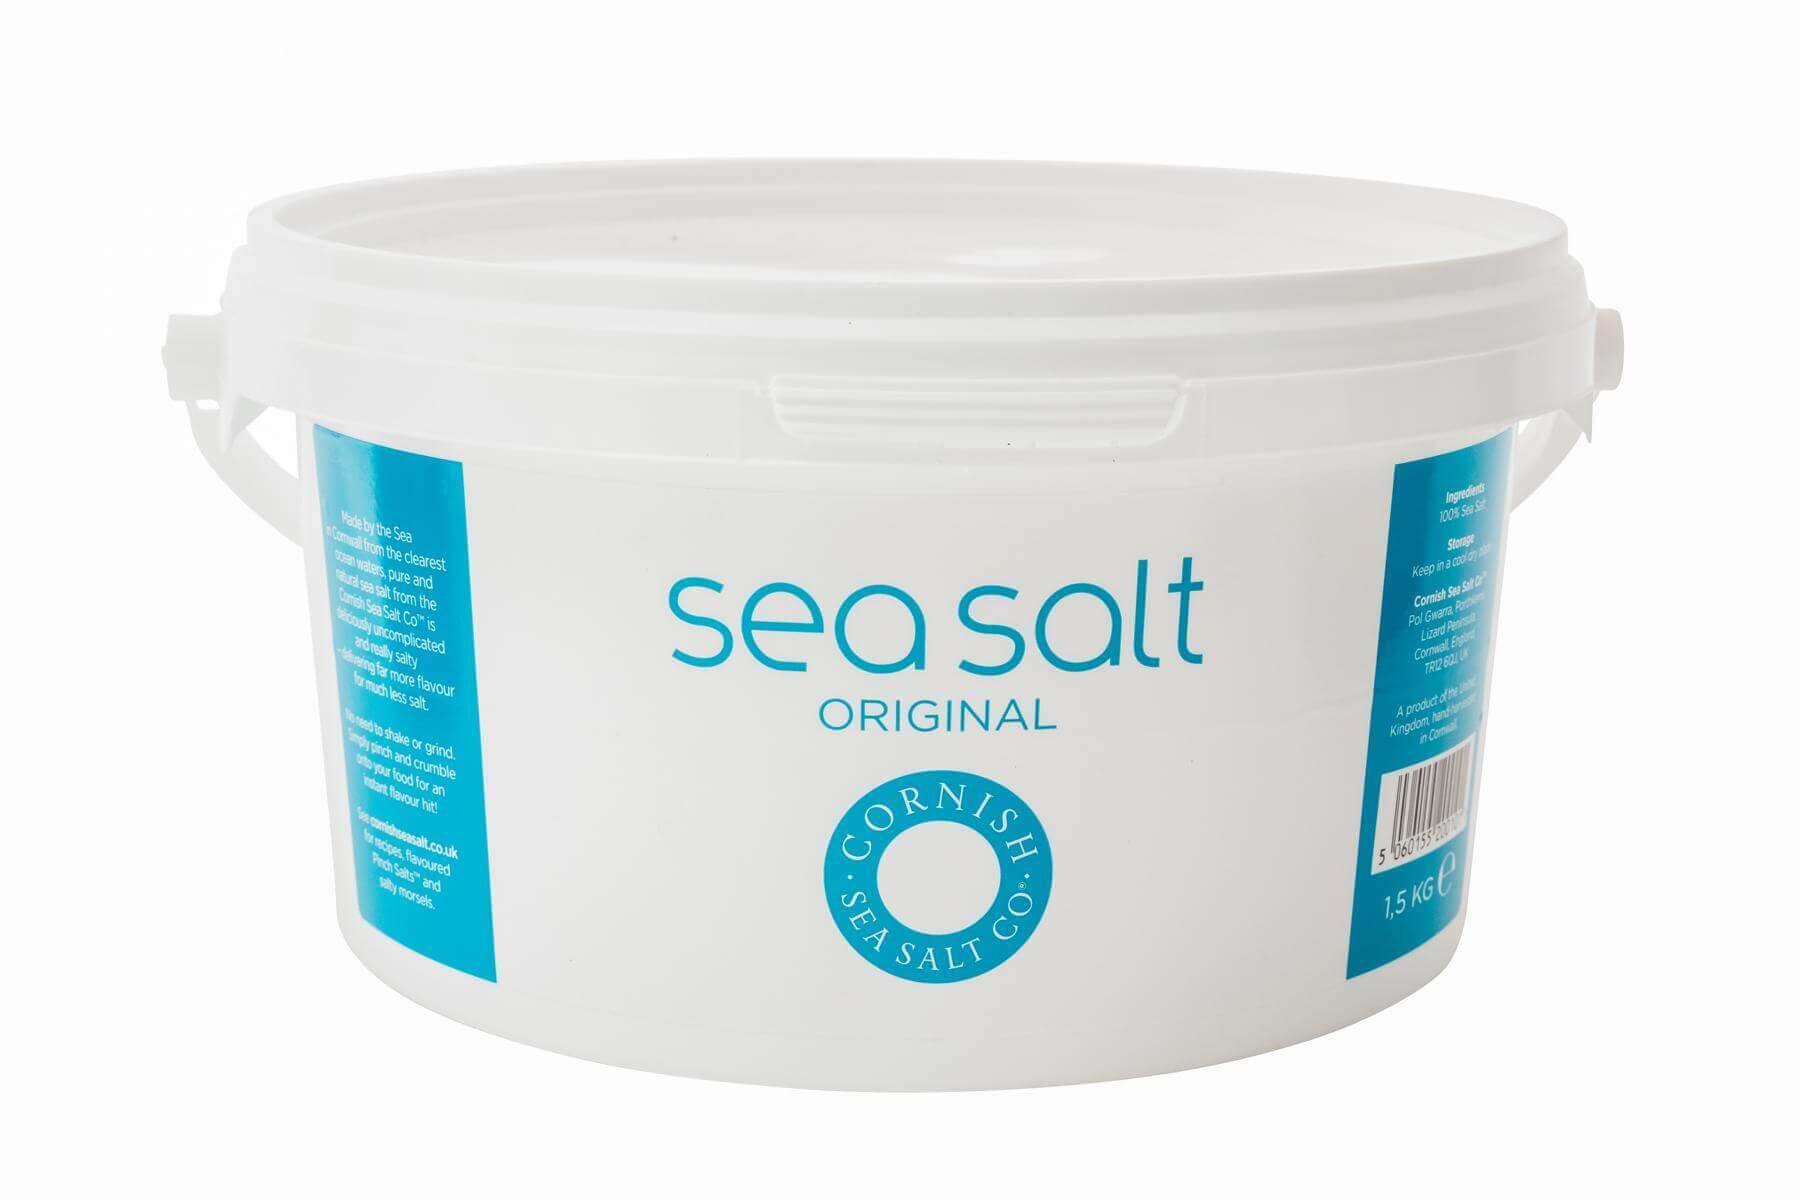 Meersalz - Cornish Sea Salt kaufen Cornish Sea Salt Original Meersalz Tub Cornish Sea Salt Crystals Cornish Sea Salt Meersalz - Cornish Sea Salt kaufen